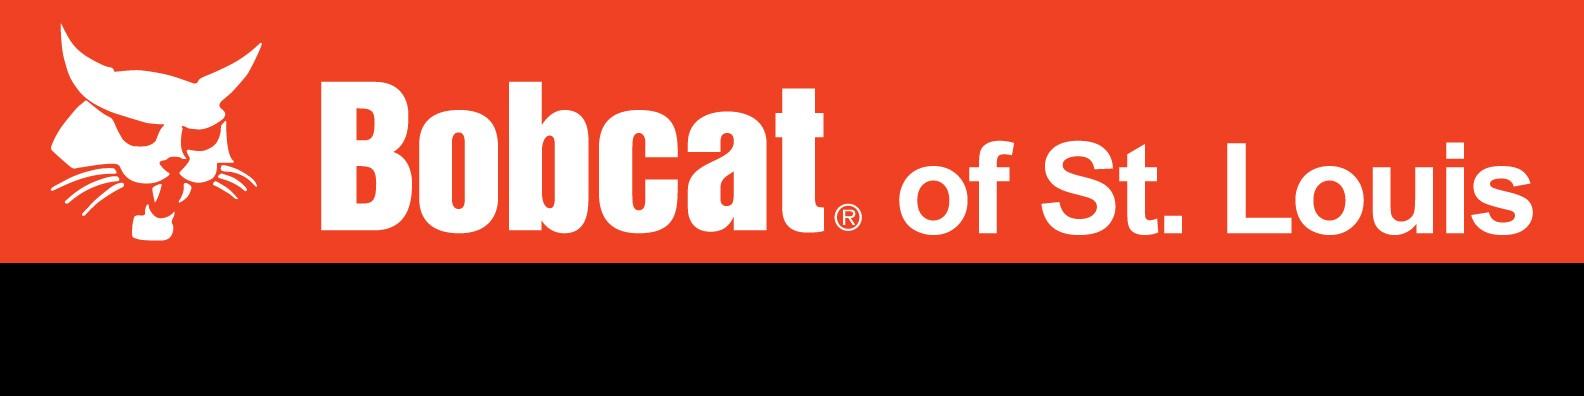 Bobcat of St  Louis Dealer Network | LinkedIn